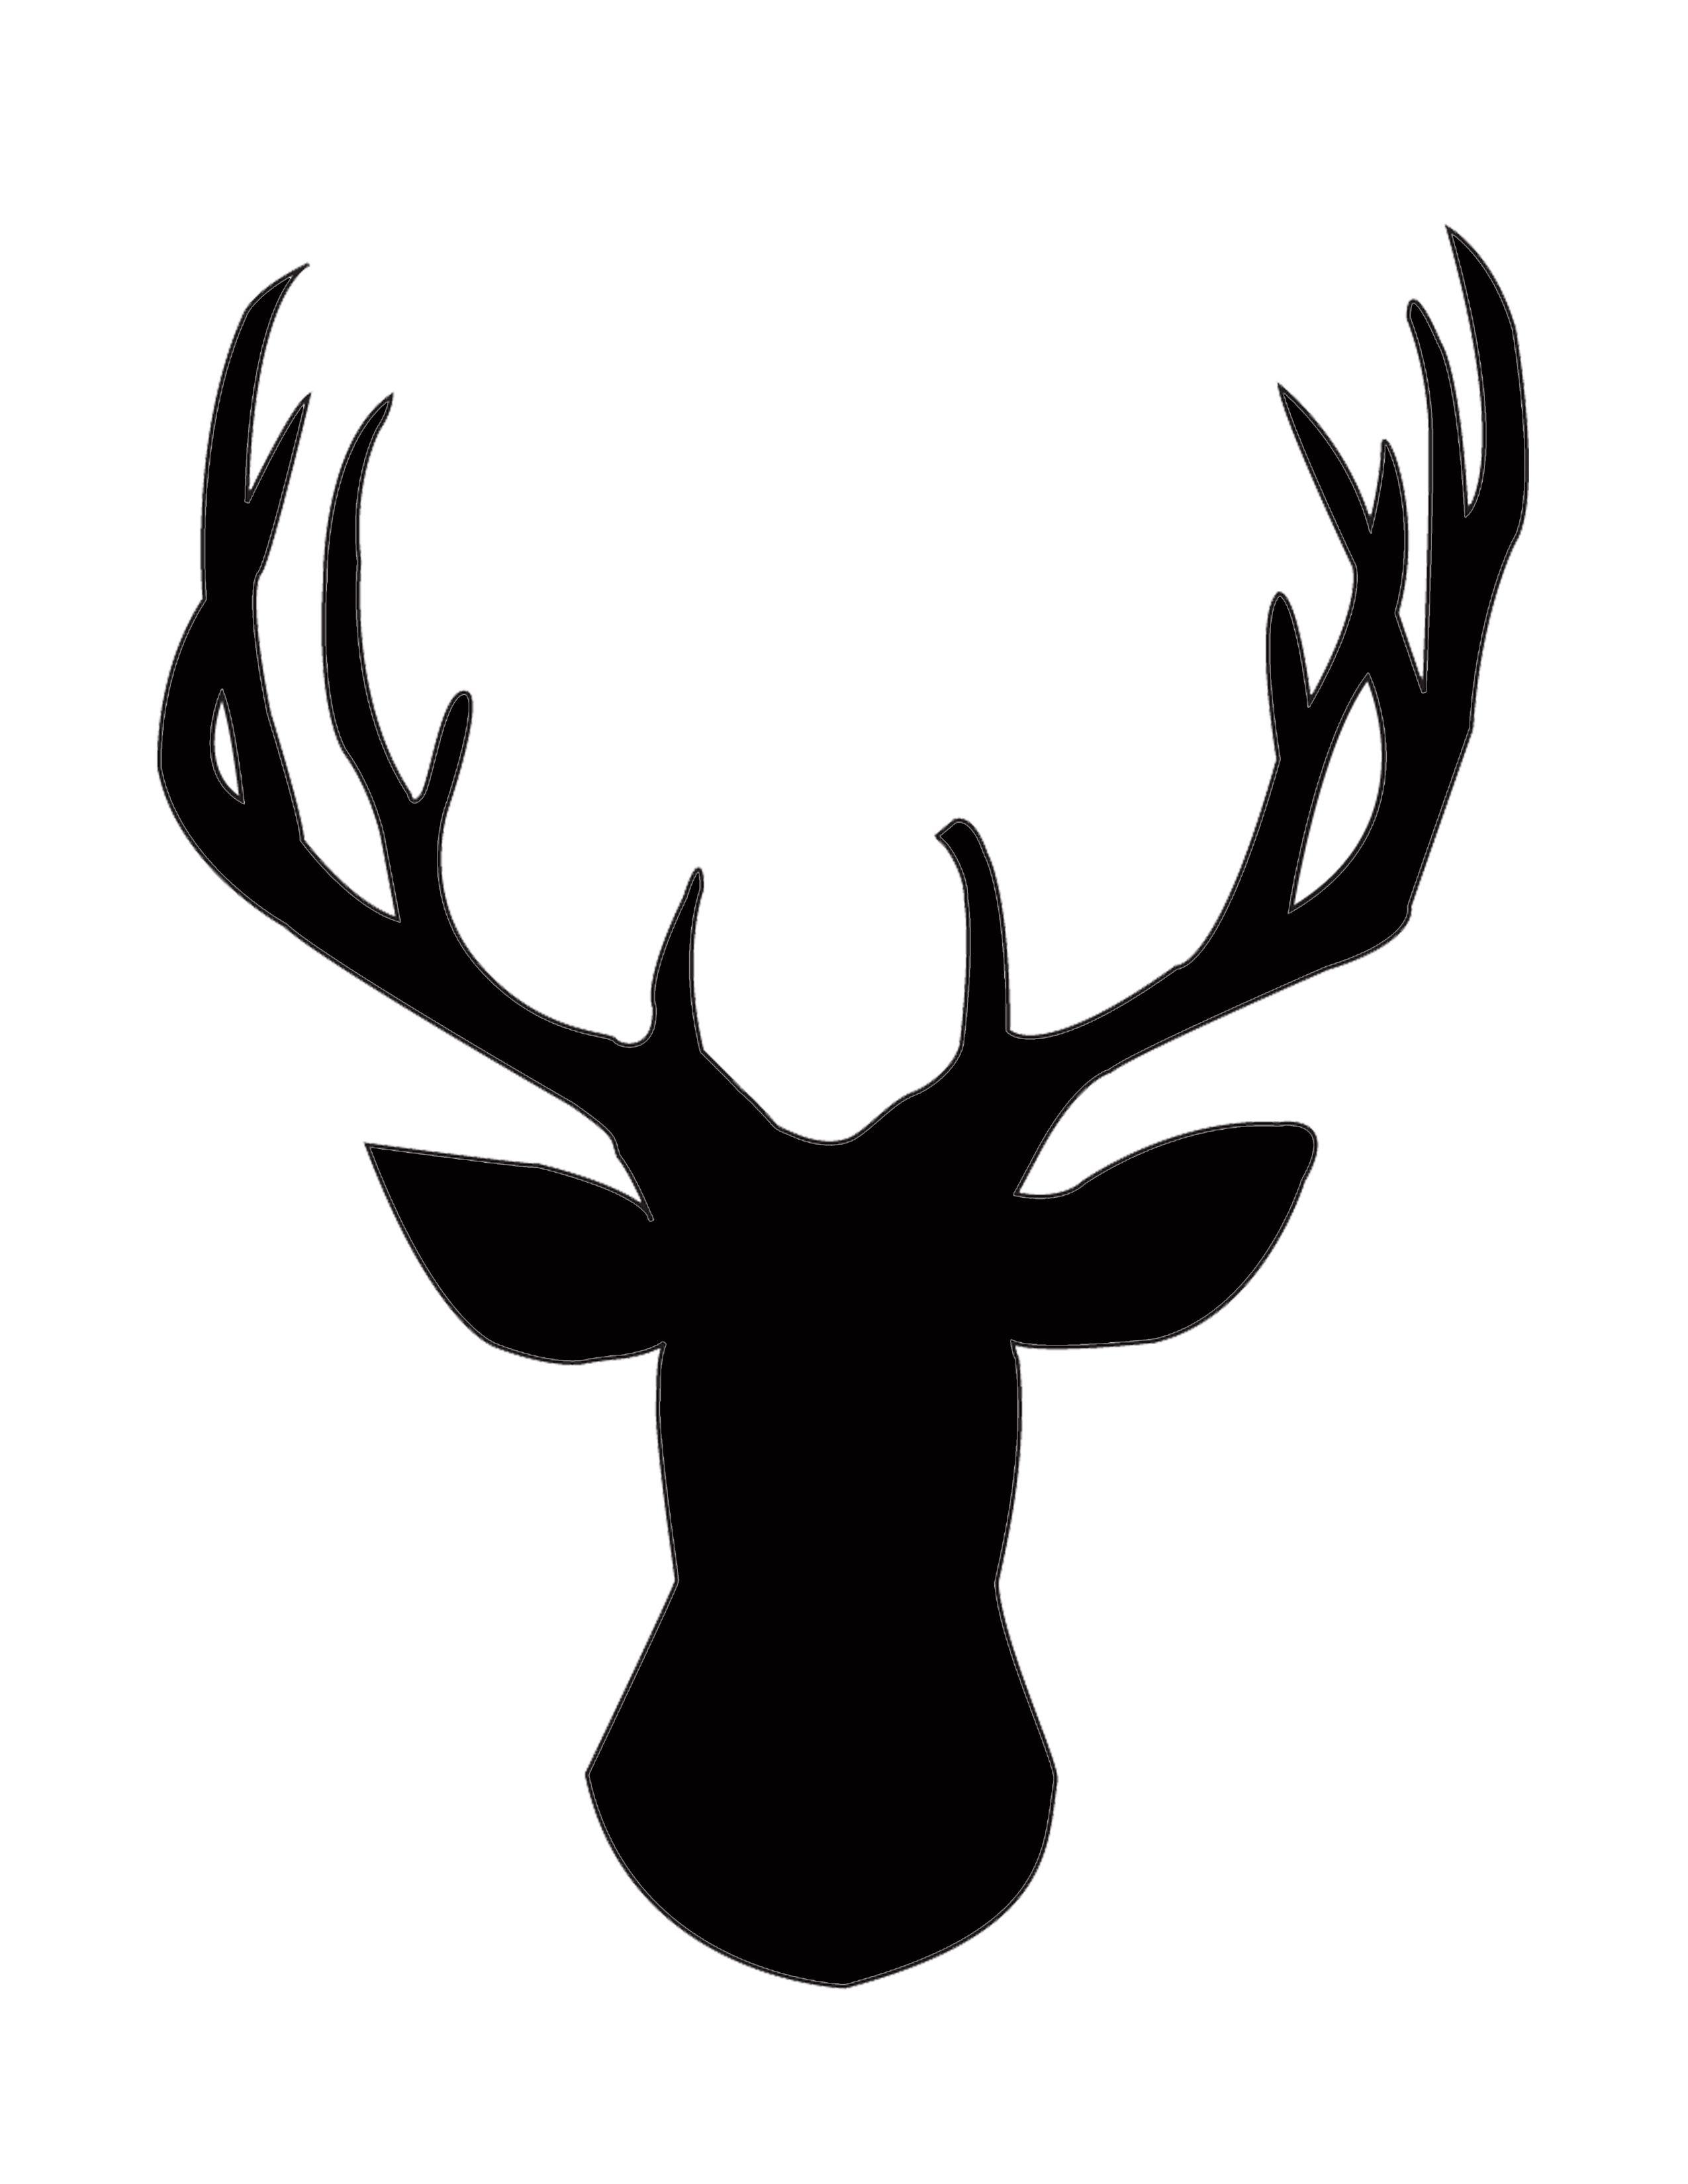 2550x3300 Diy Gold Foil Deer Head Silhouette Free